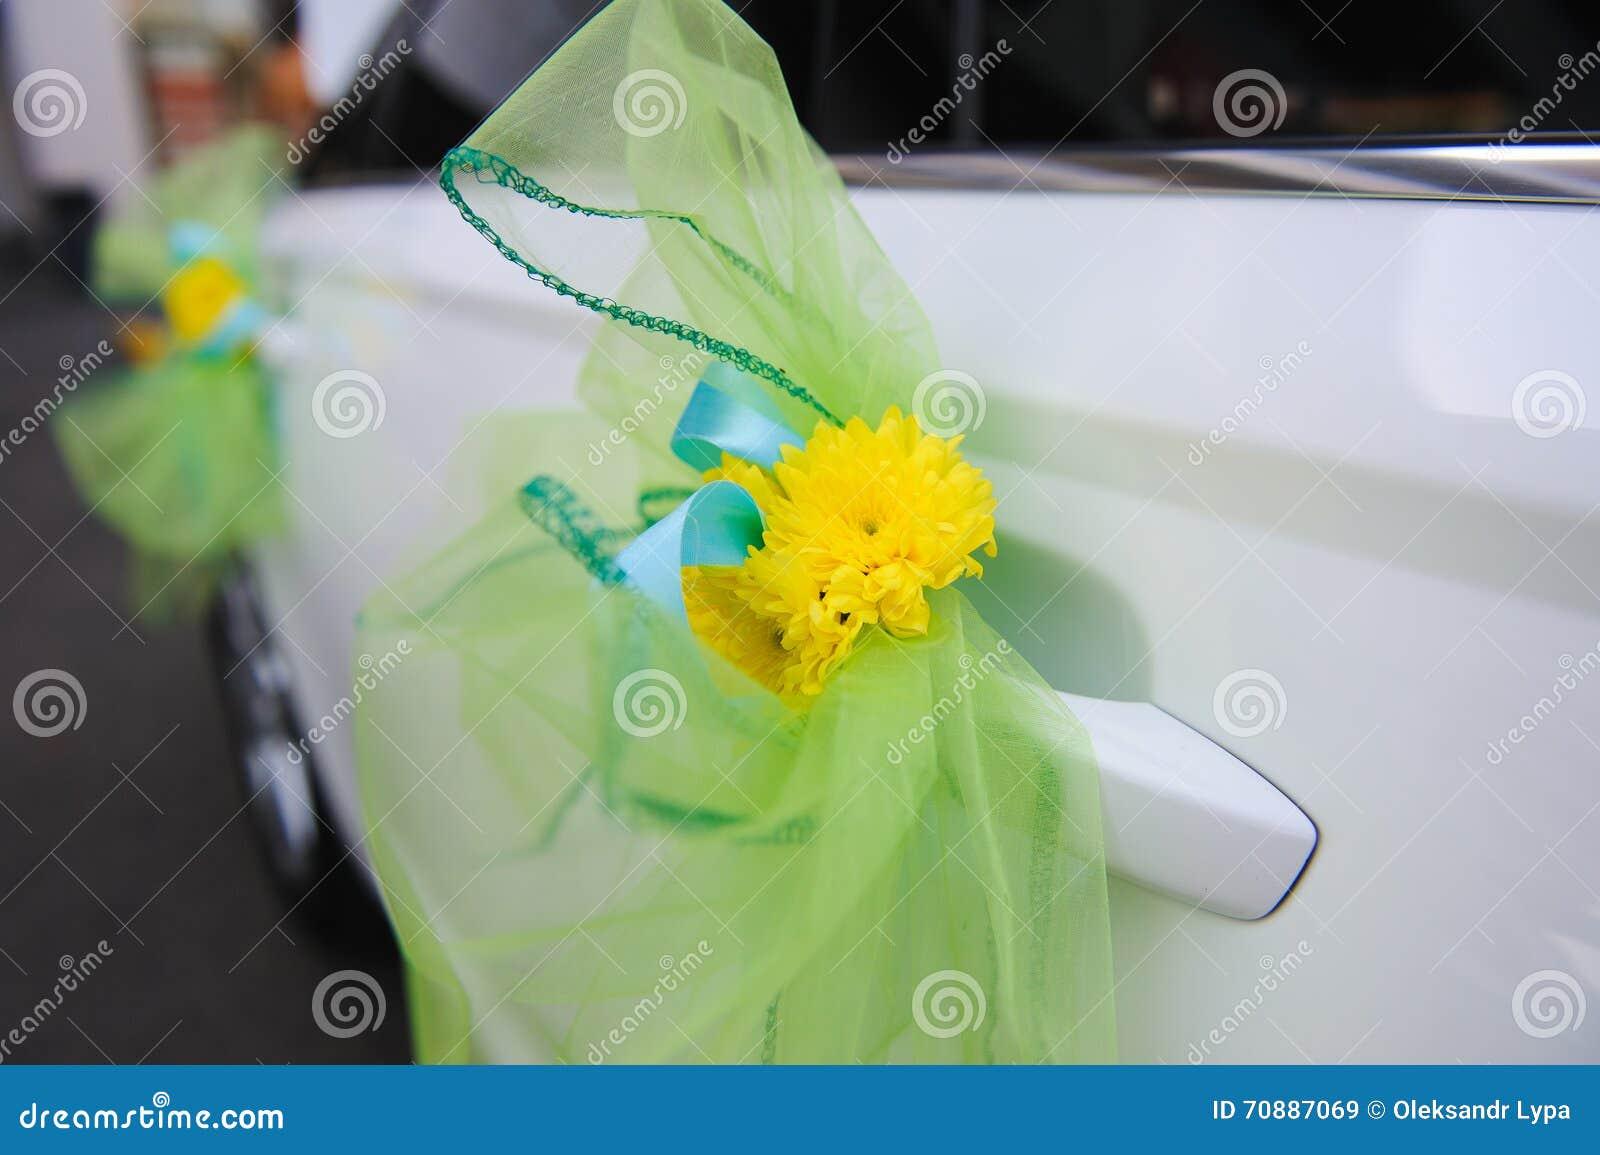 Wedding Decor On The Car Handle Stock Image Image Of Marriage